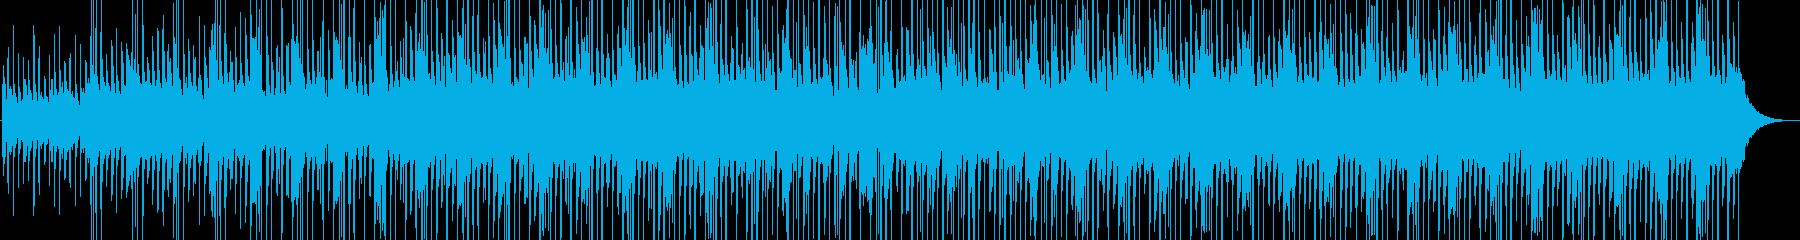 Funny musicの再生済みの波形